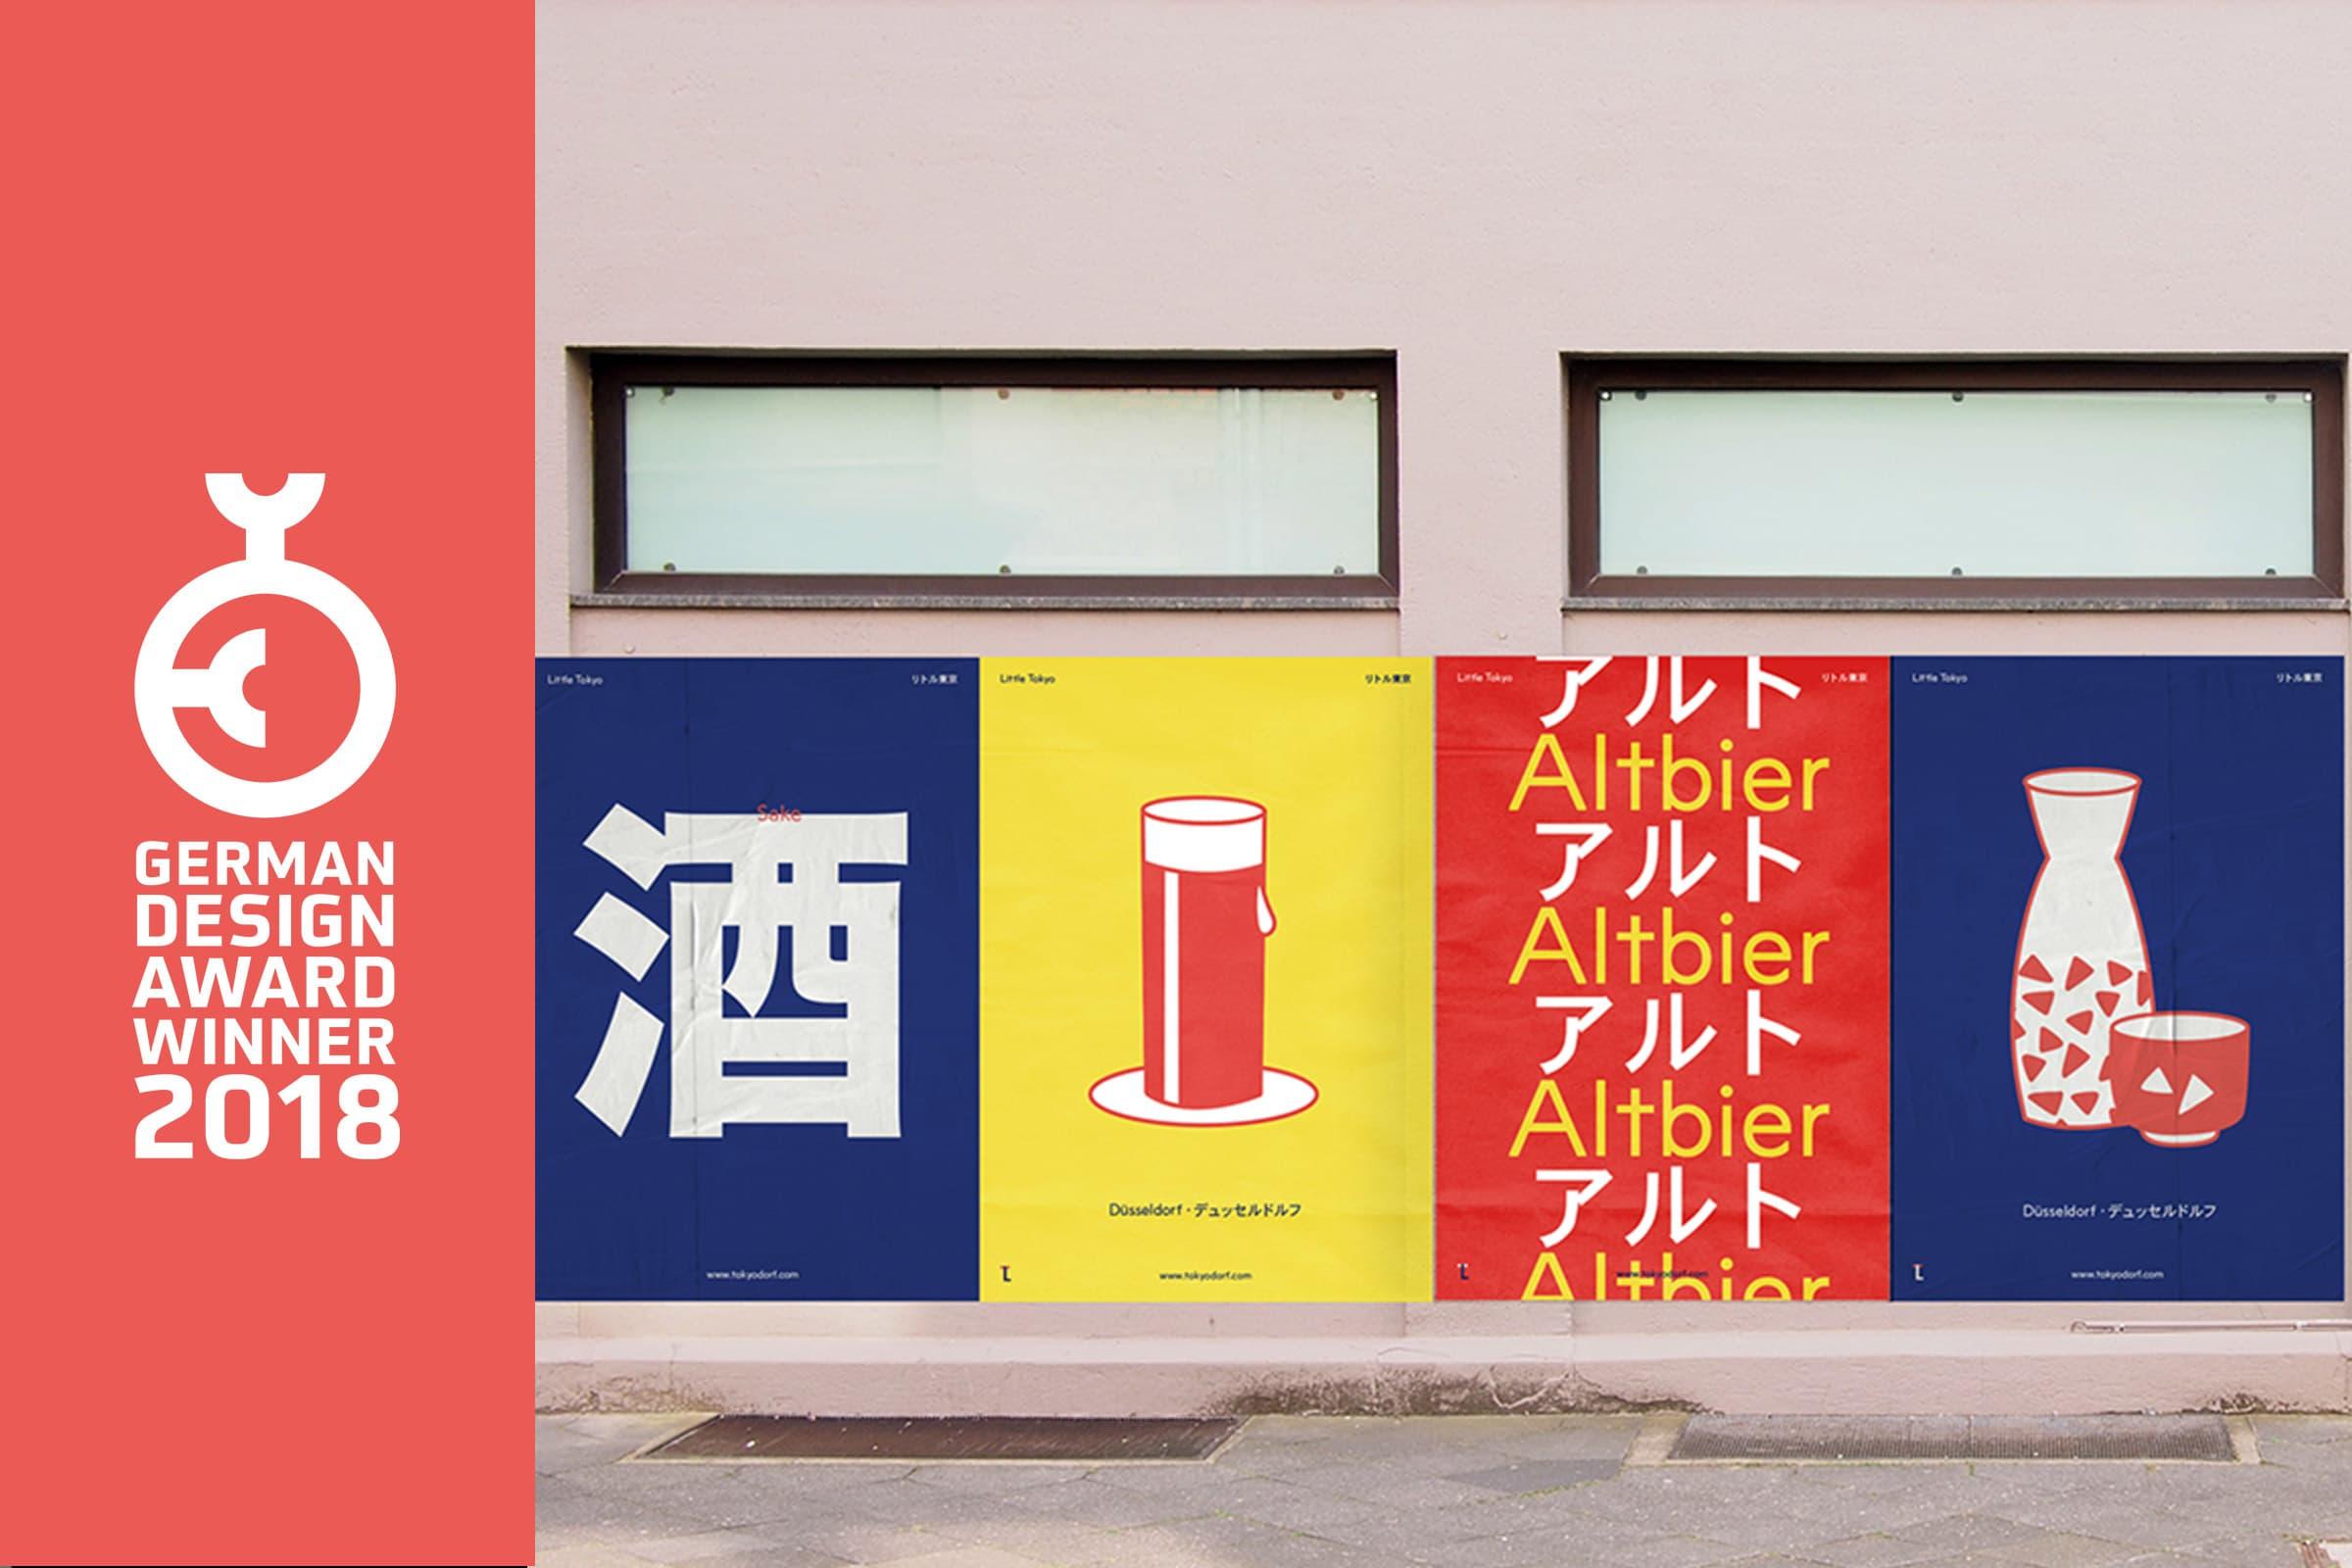 German Design Award Winner 2018, Düsseldorf, Japanviertel, Japan, Nihon